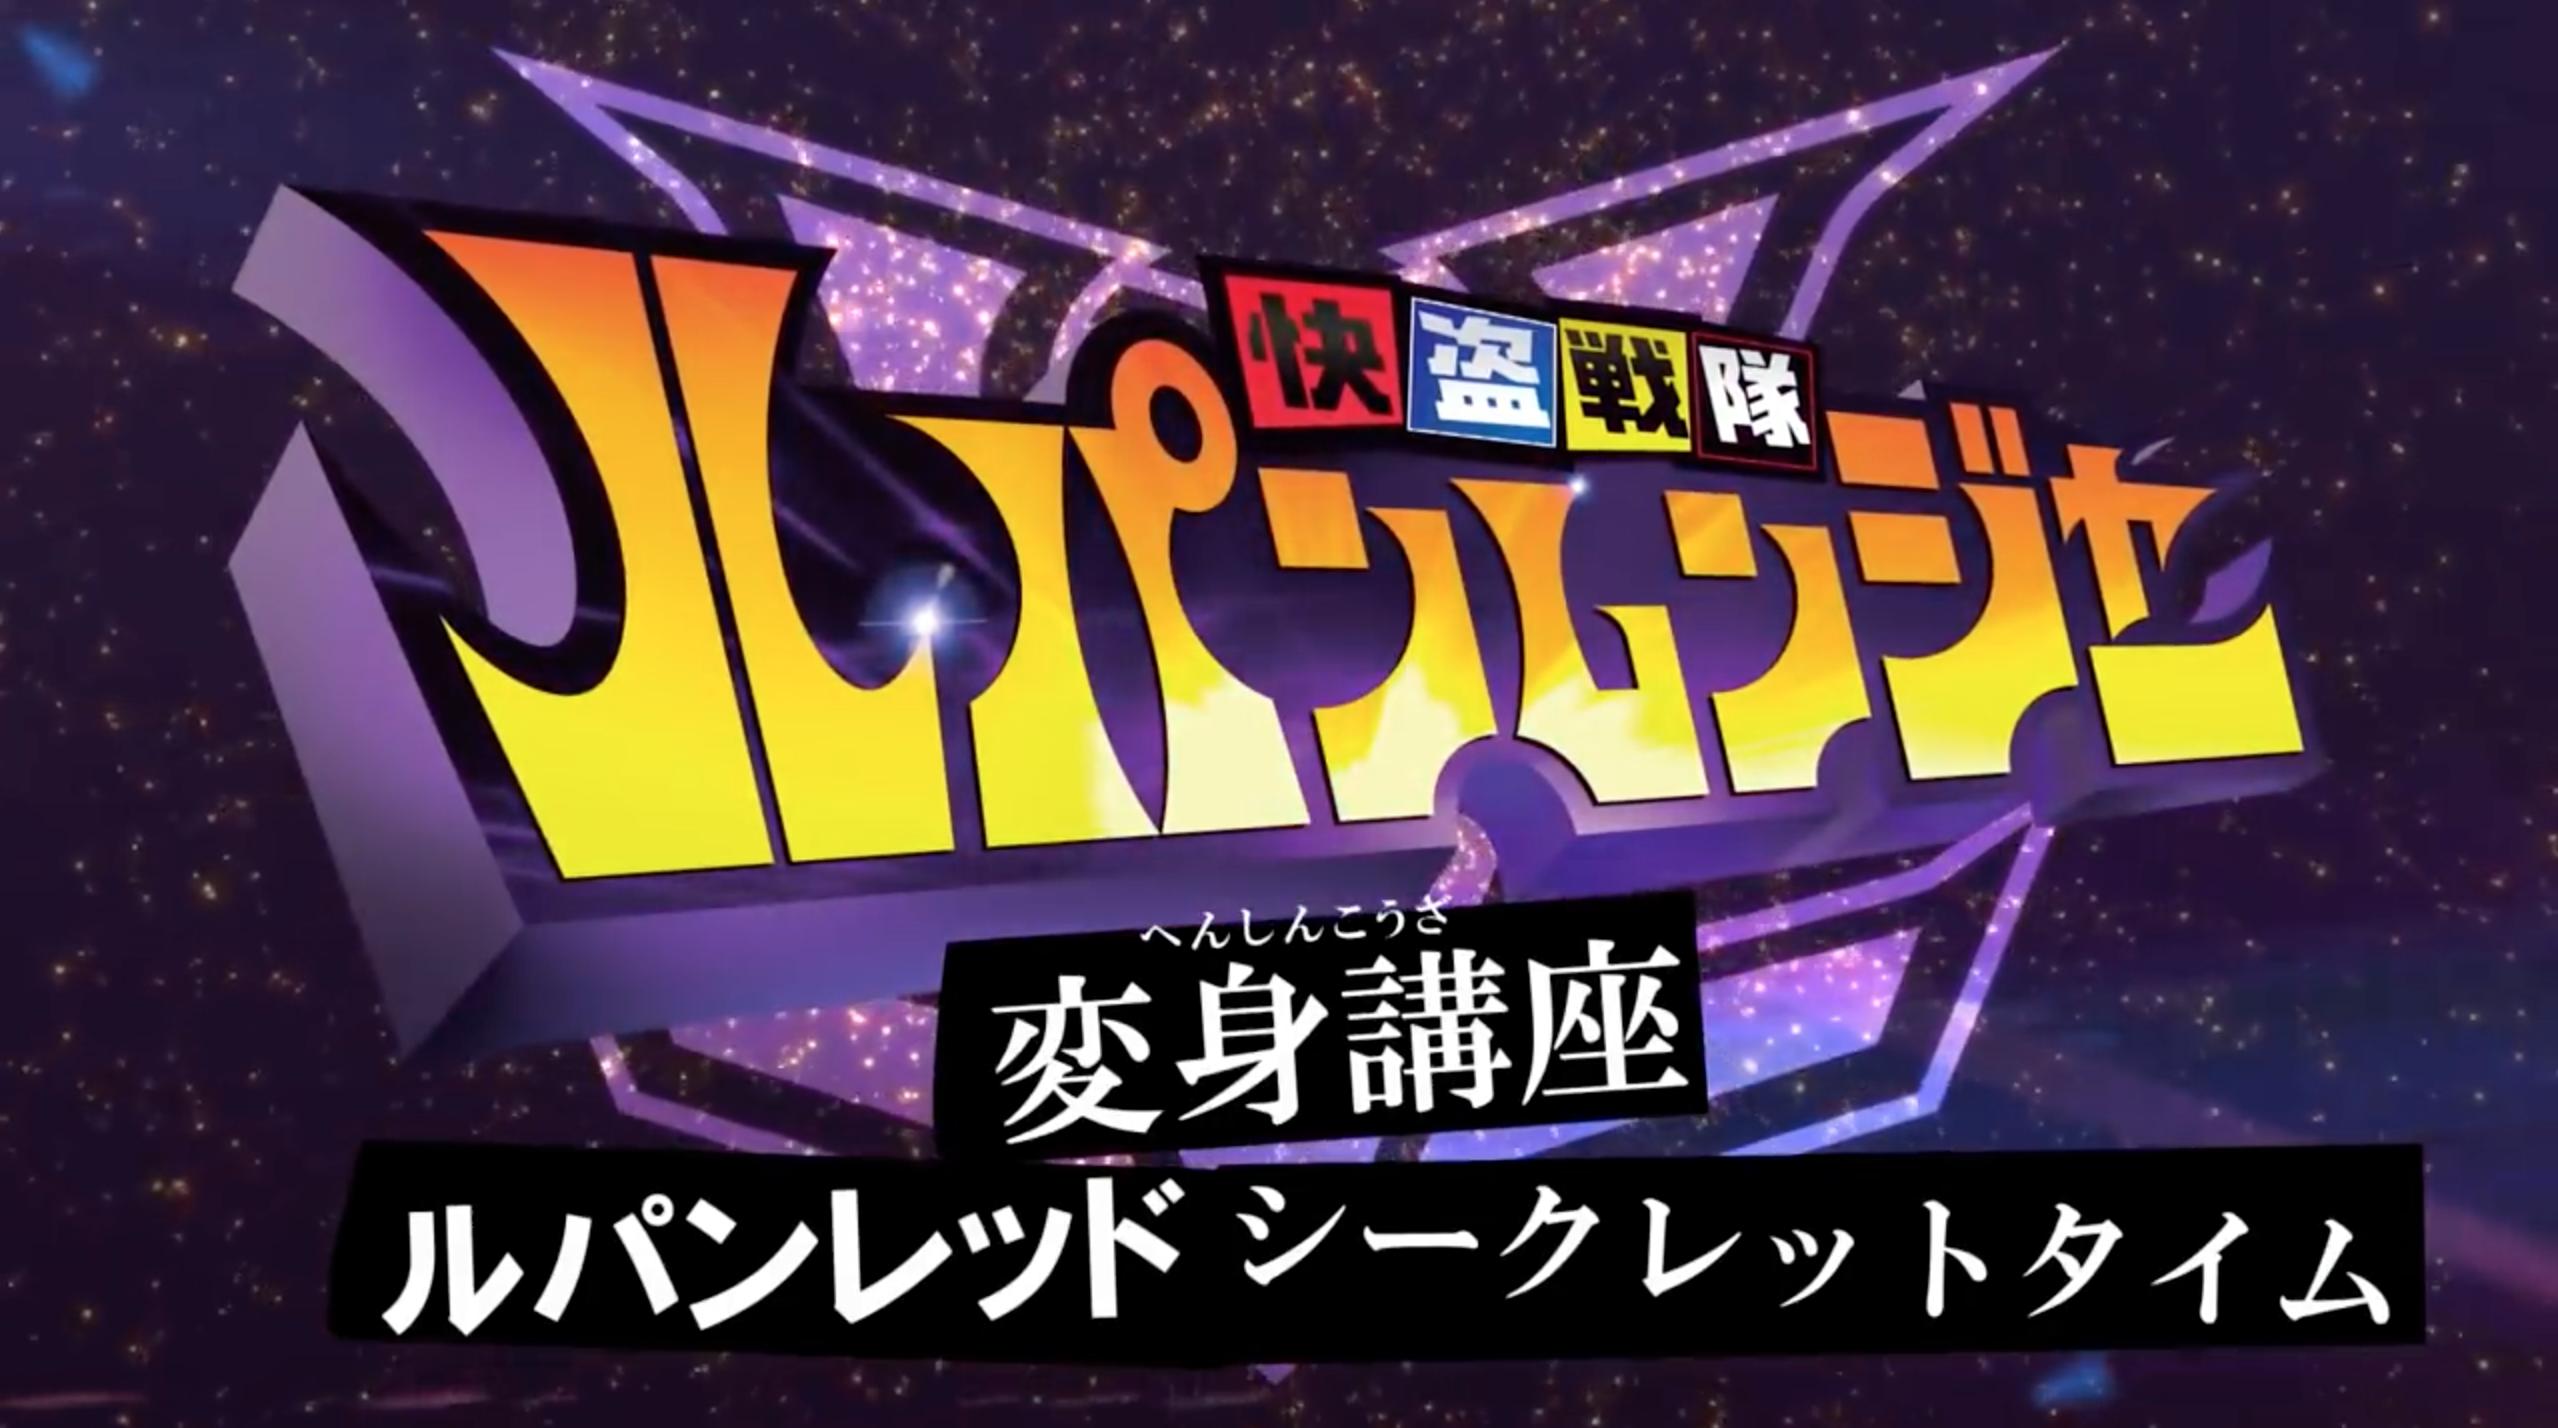 Kaitou Sentai Lupinranger Transformation Lesson: Lupin Red's Secret Time